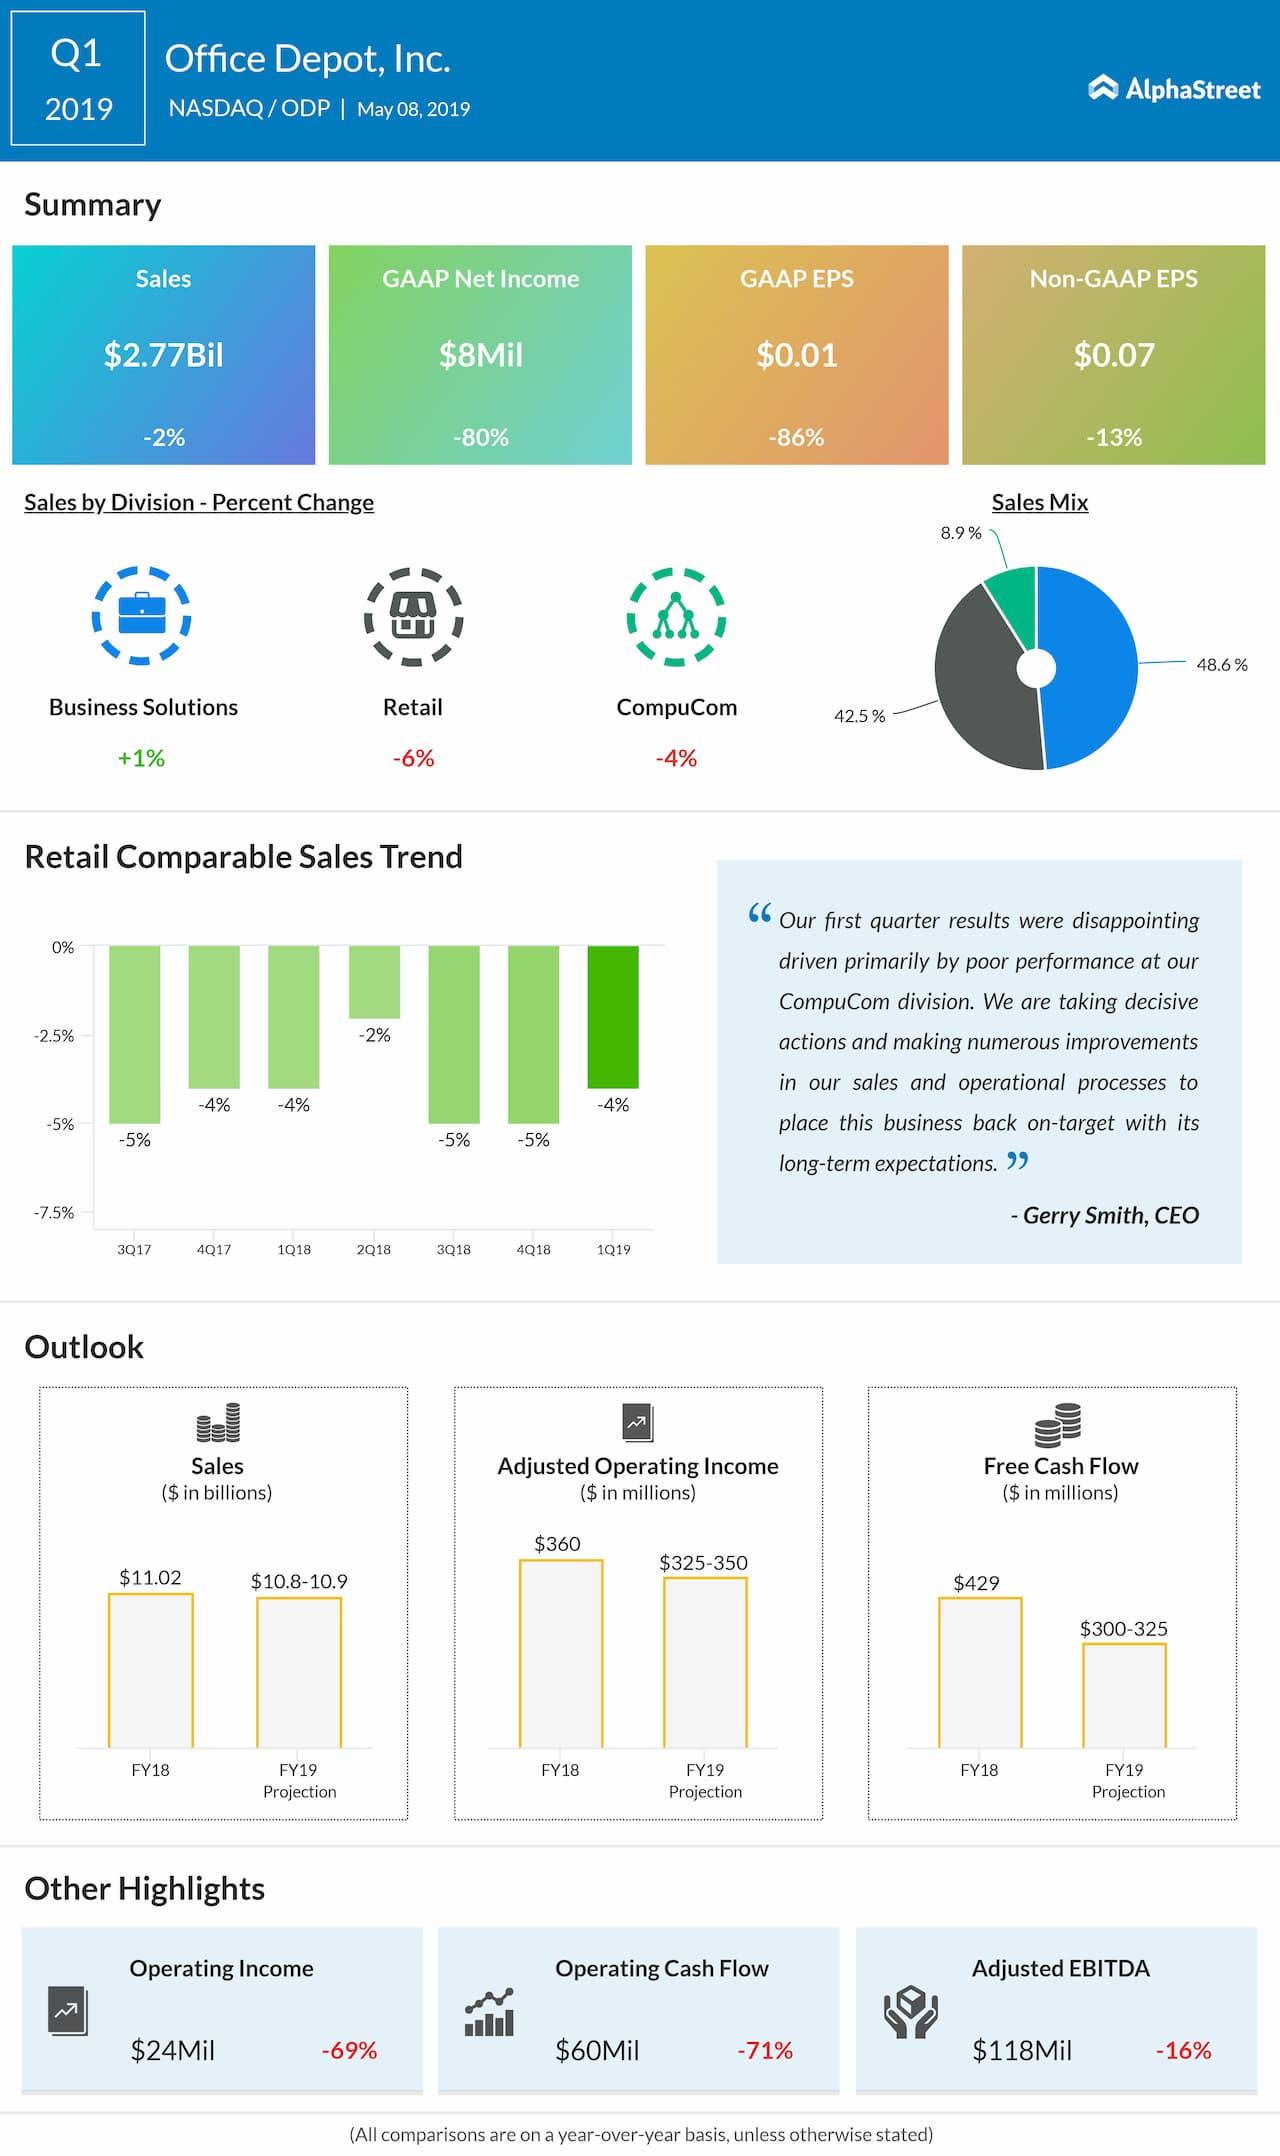 Office Depot (ODP) first quarter 2019 earnings snapshot